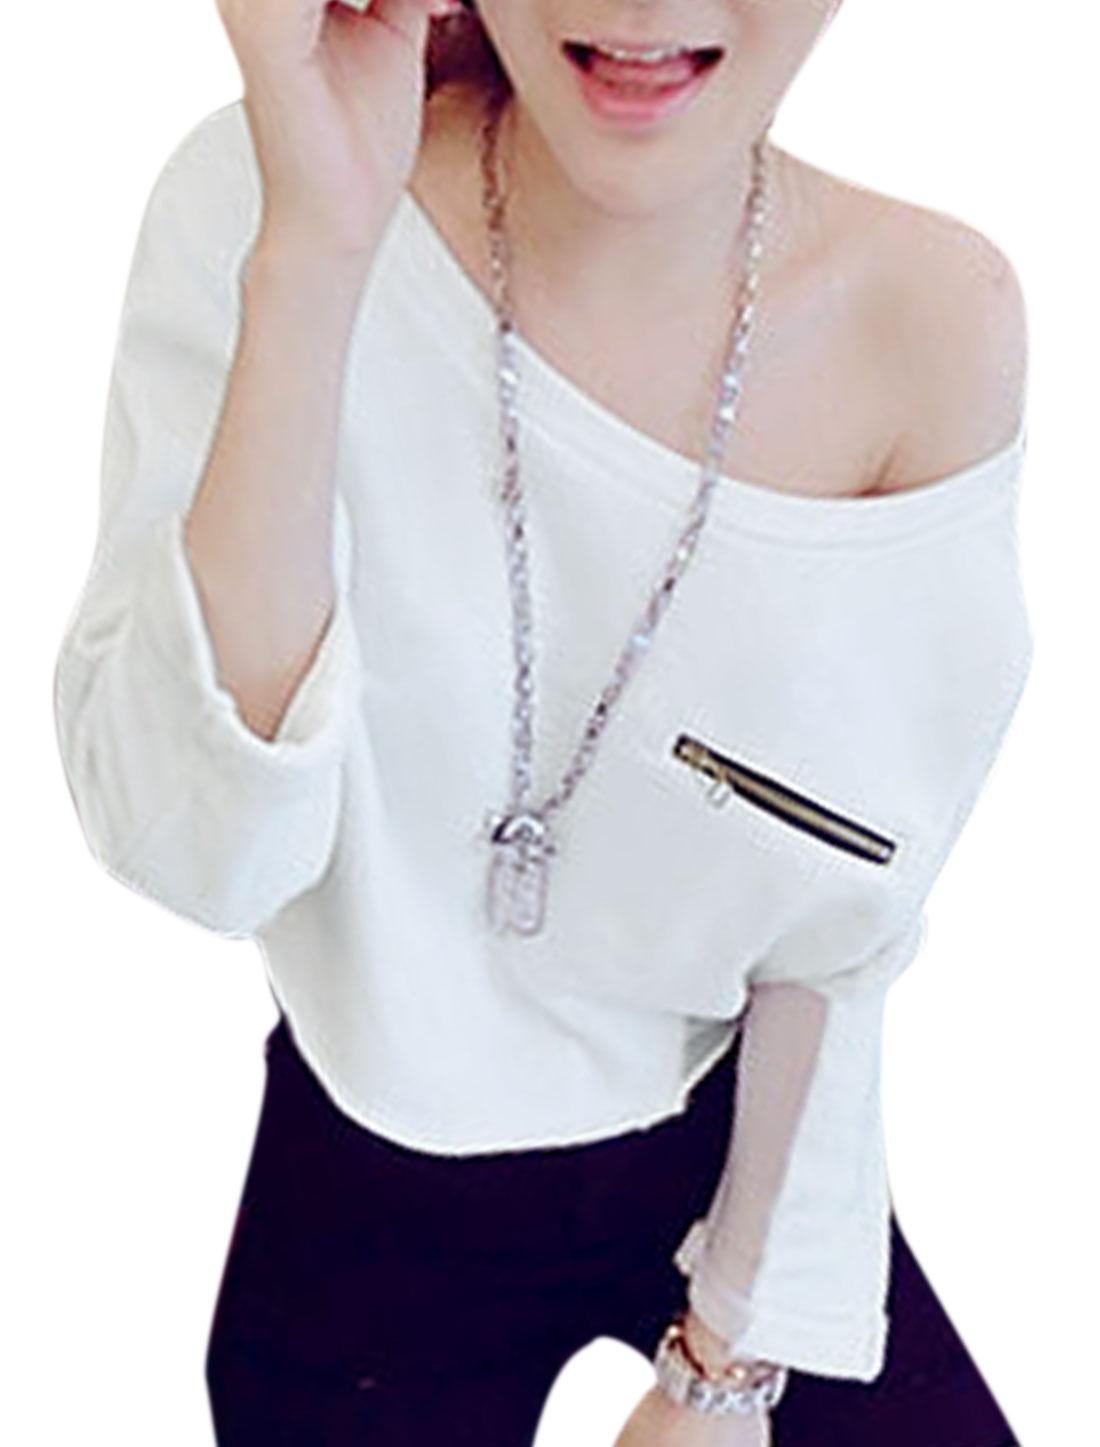 Women Batwing Sleeve Chiffon Panel Zipper Decor Front Slipover Shirt White XS